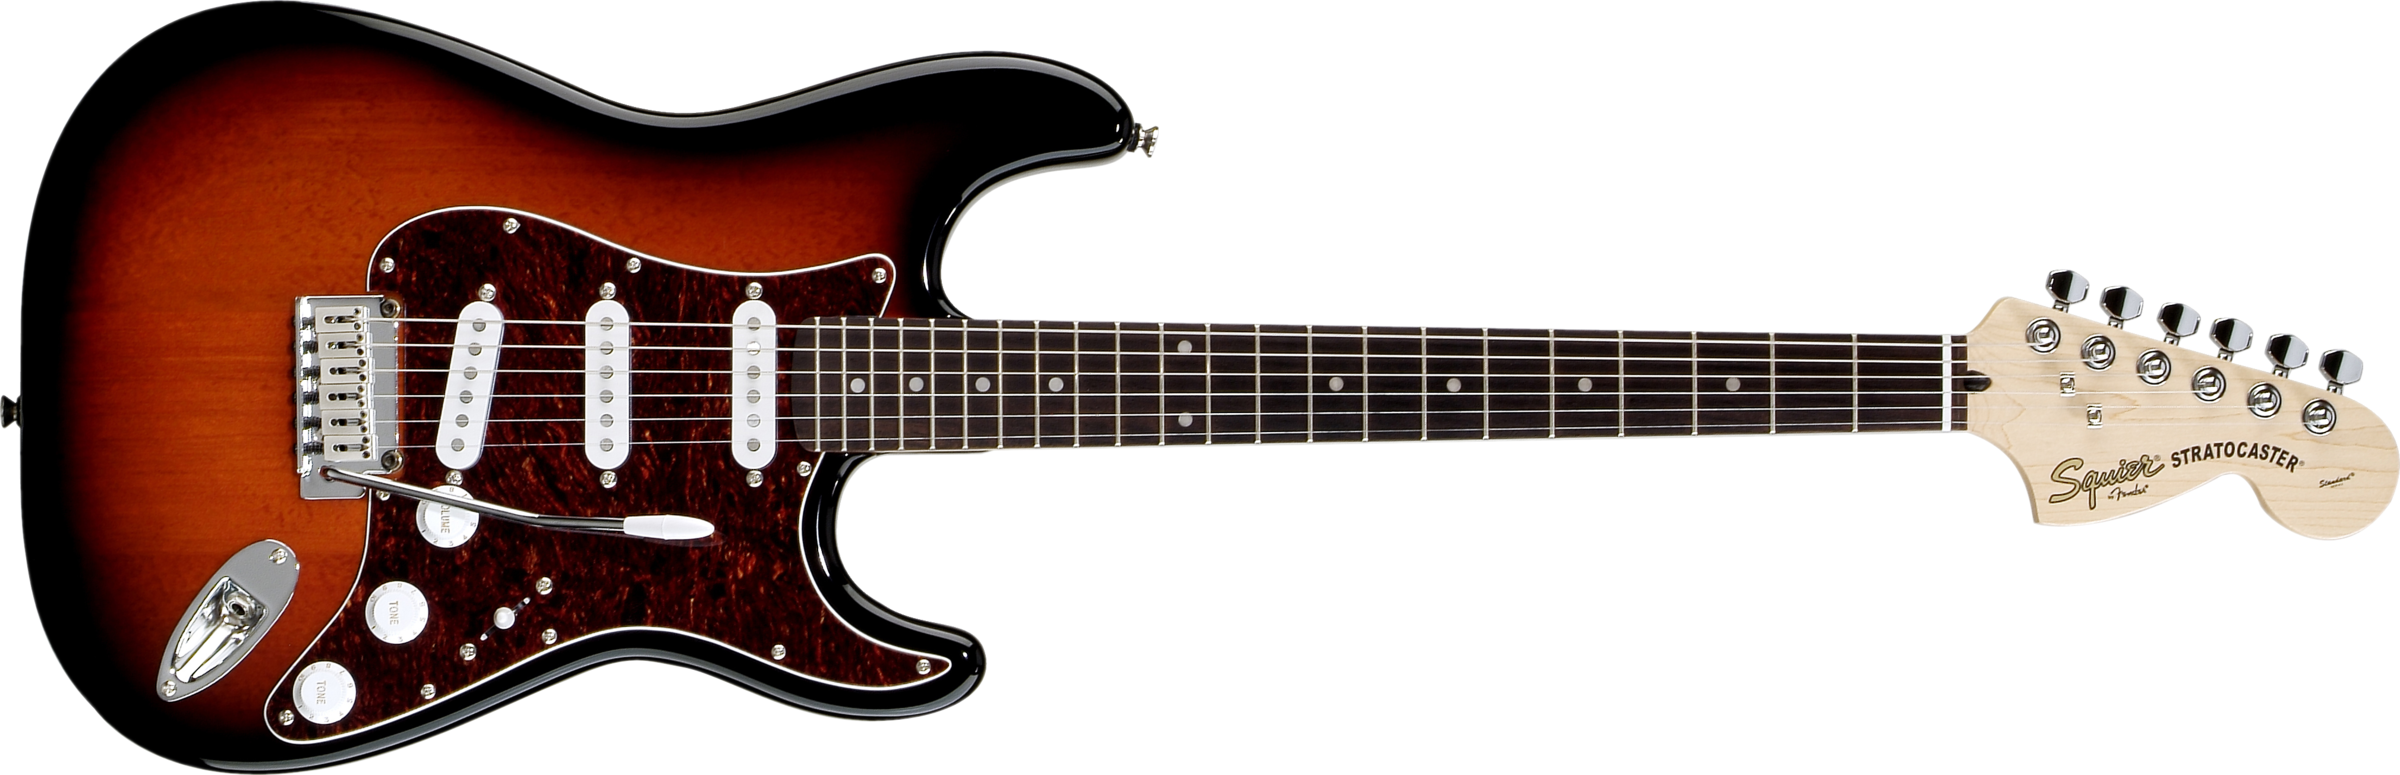 datant chinois Squier guitares